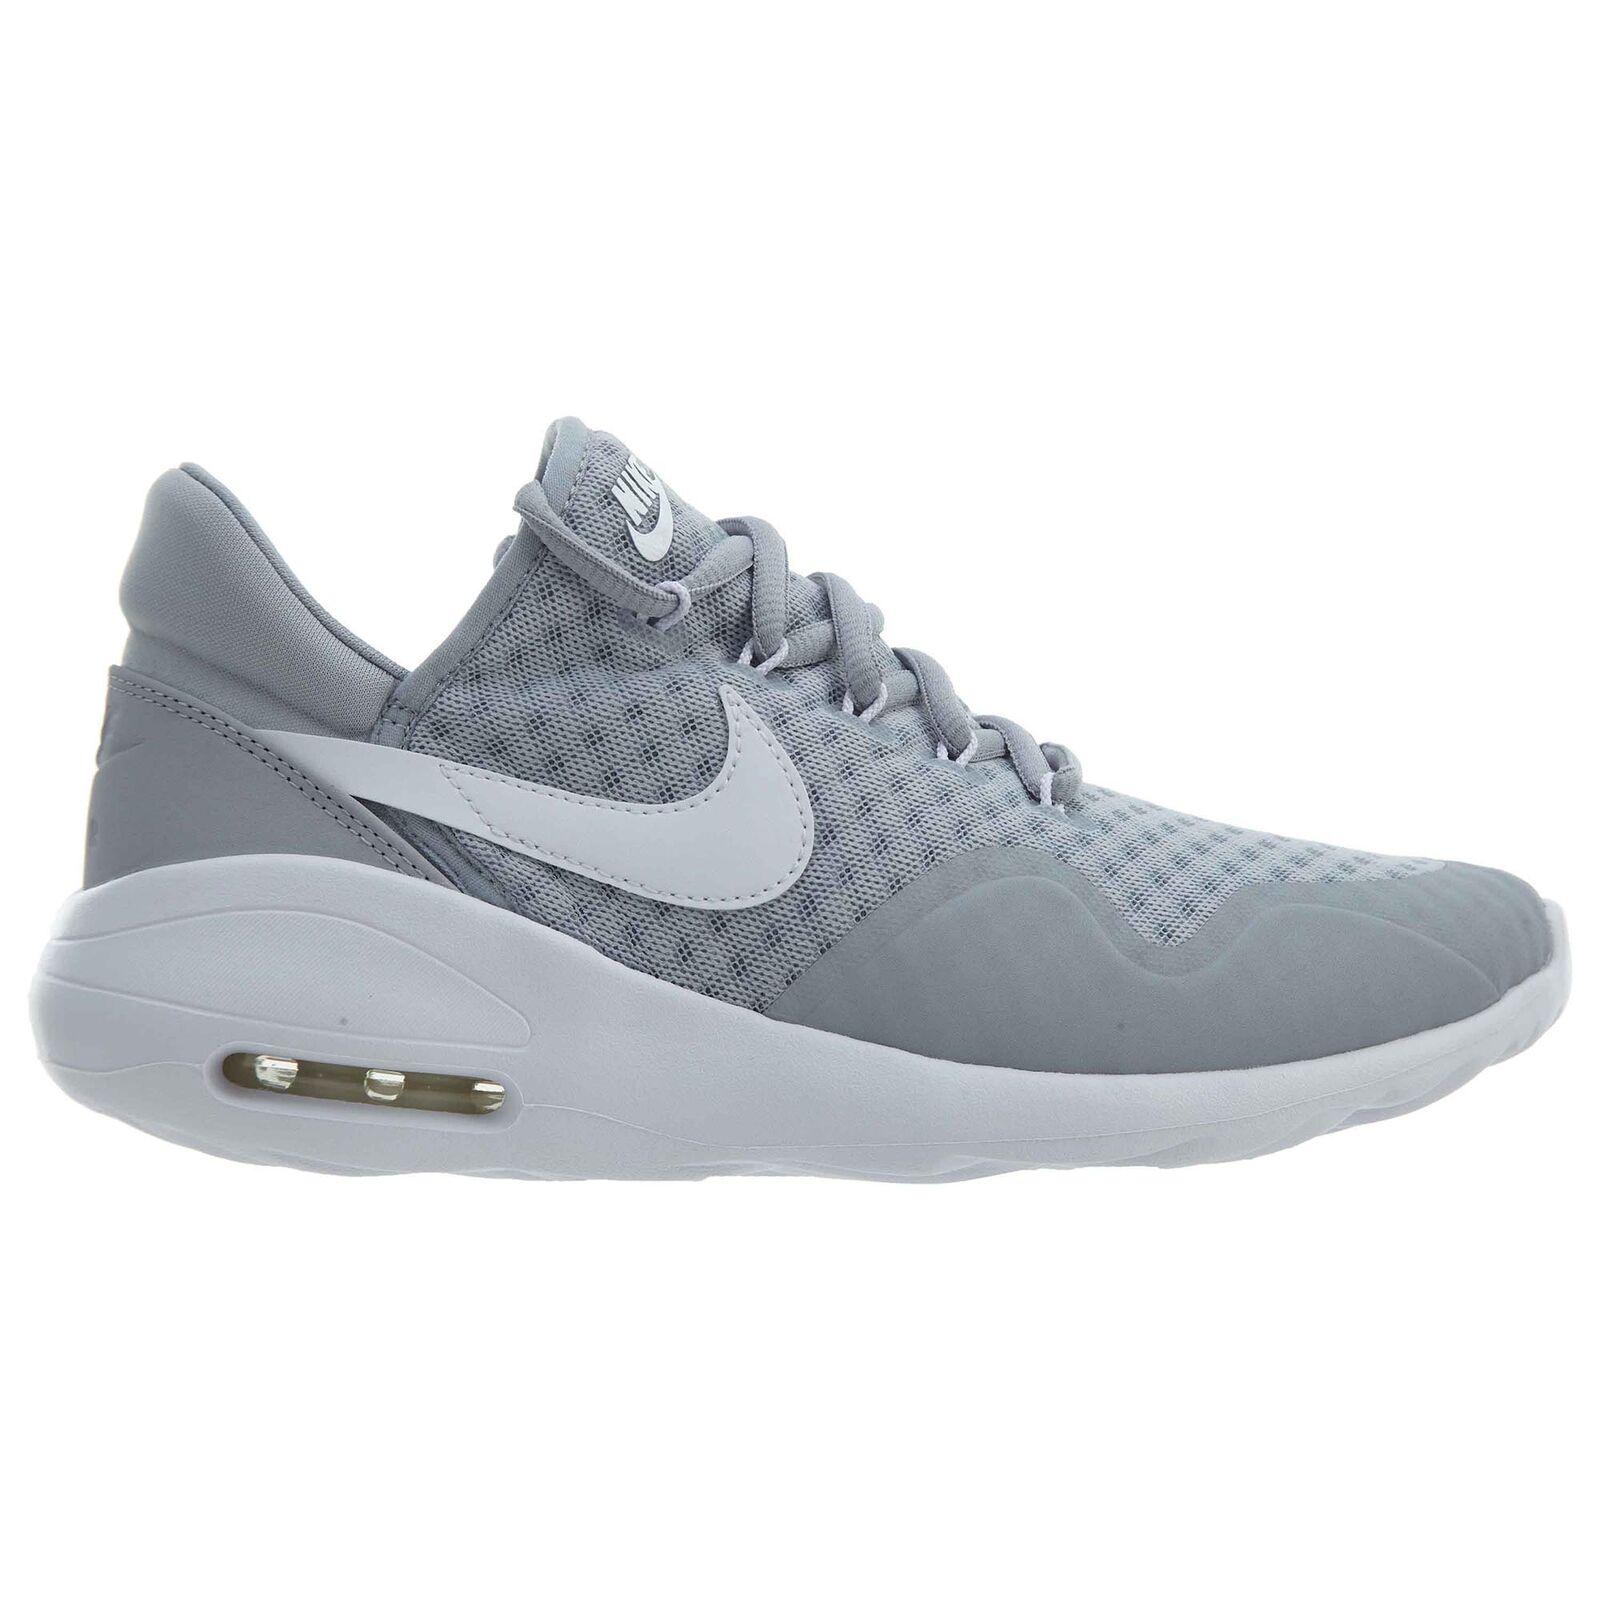 Nike Air Max Sasha Womens 916783-002 Wolf Grey White Training Shoes Size 7.5